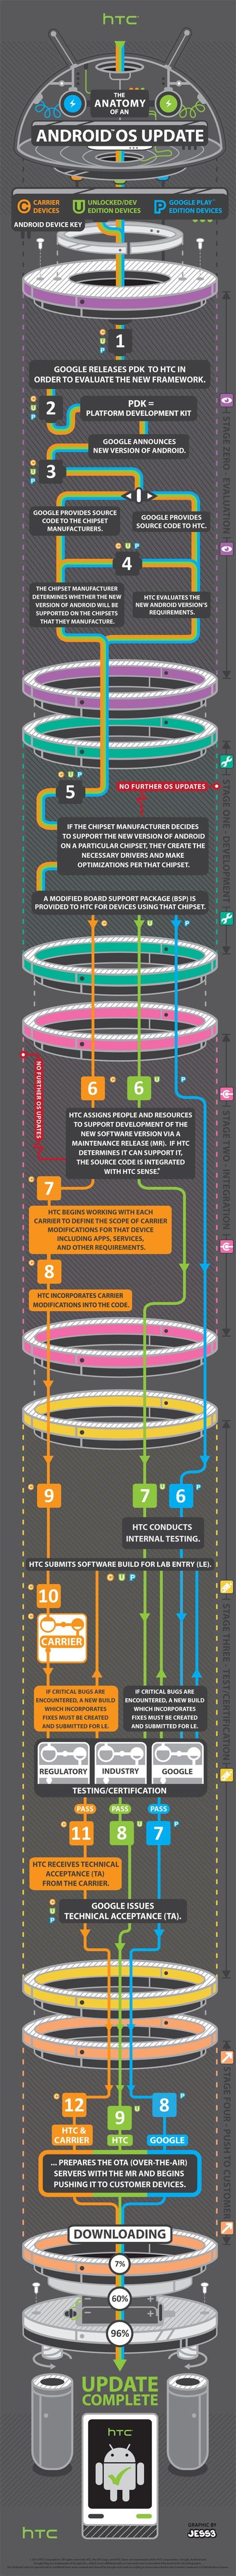 HTC infographic